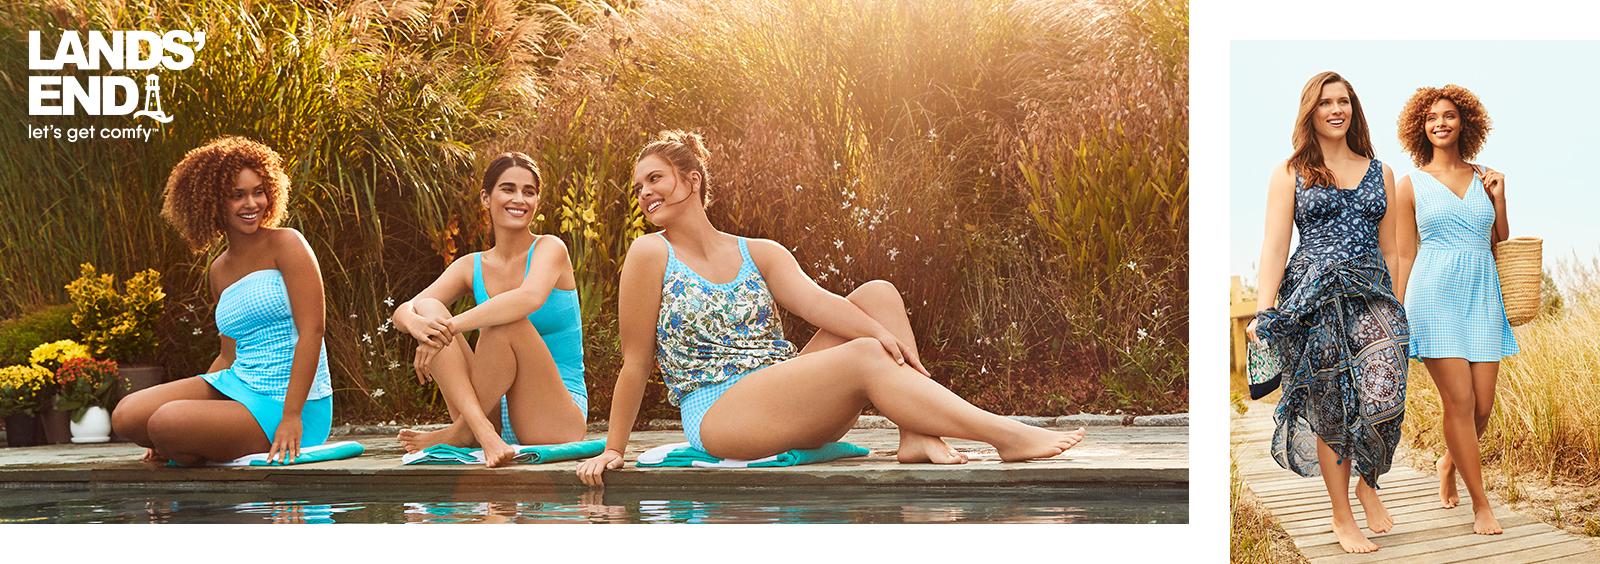 10 Swimwear Trends That Look Great on Every Body